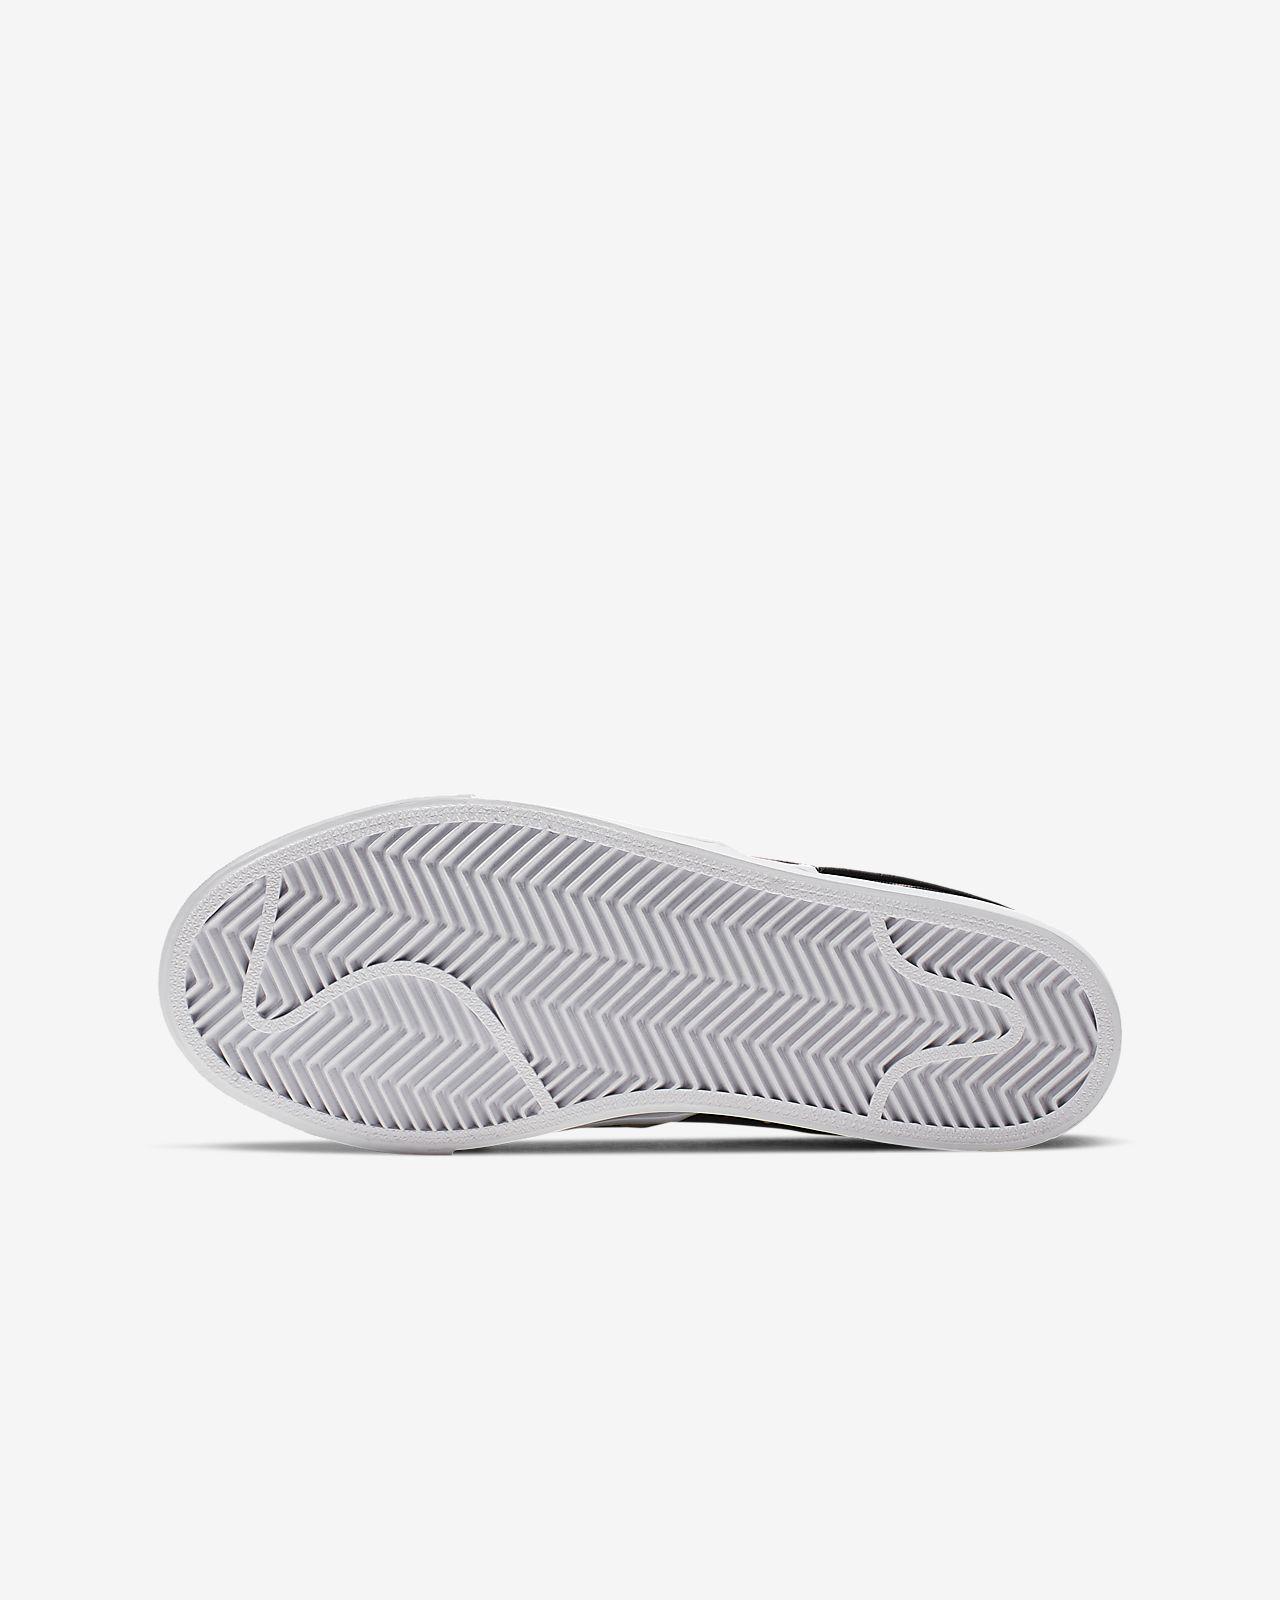 sale retailer 8946d 358ca ... Nike SB Stefan Janoski Canvas Slip Tie Dye Big Kids  Skate Shoe